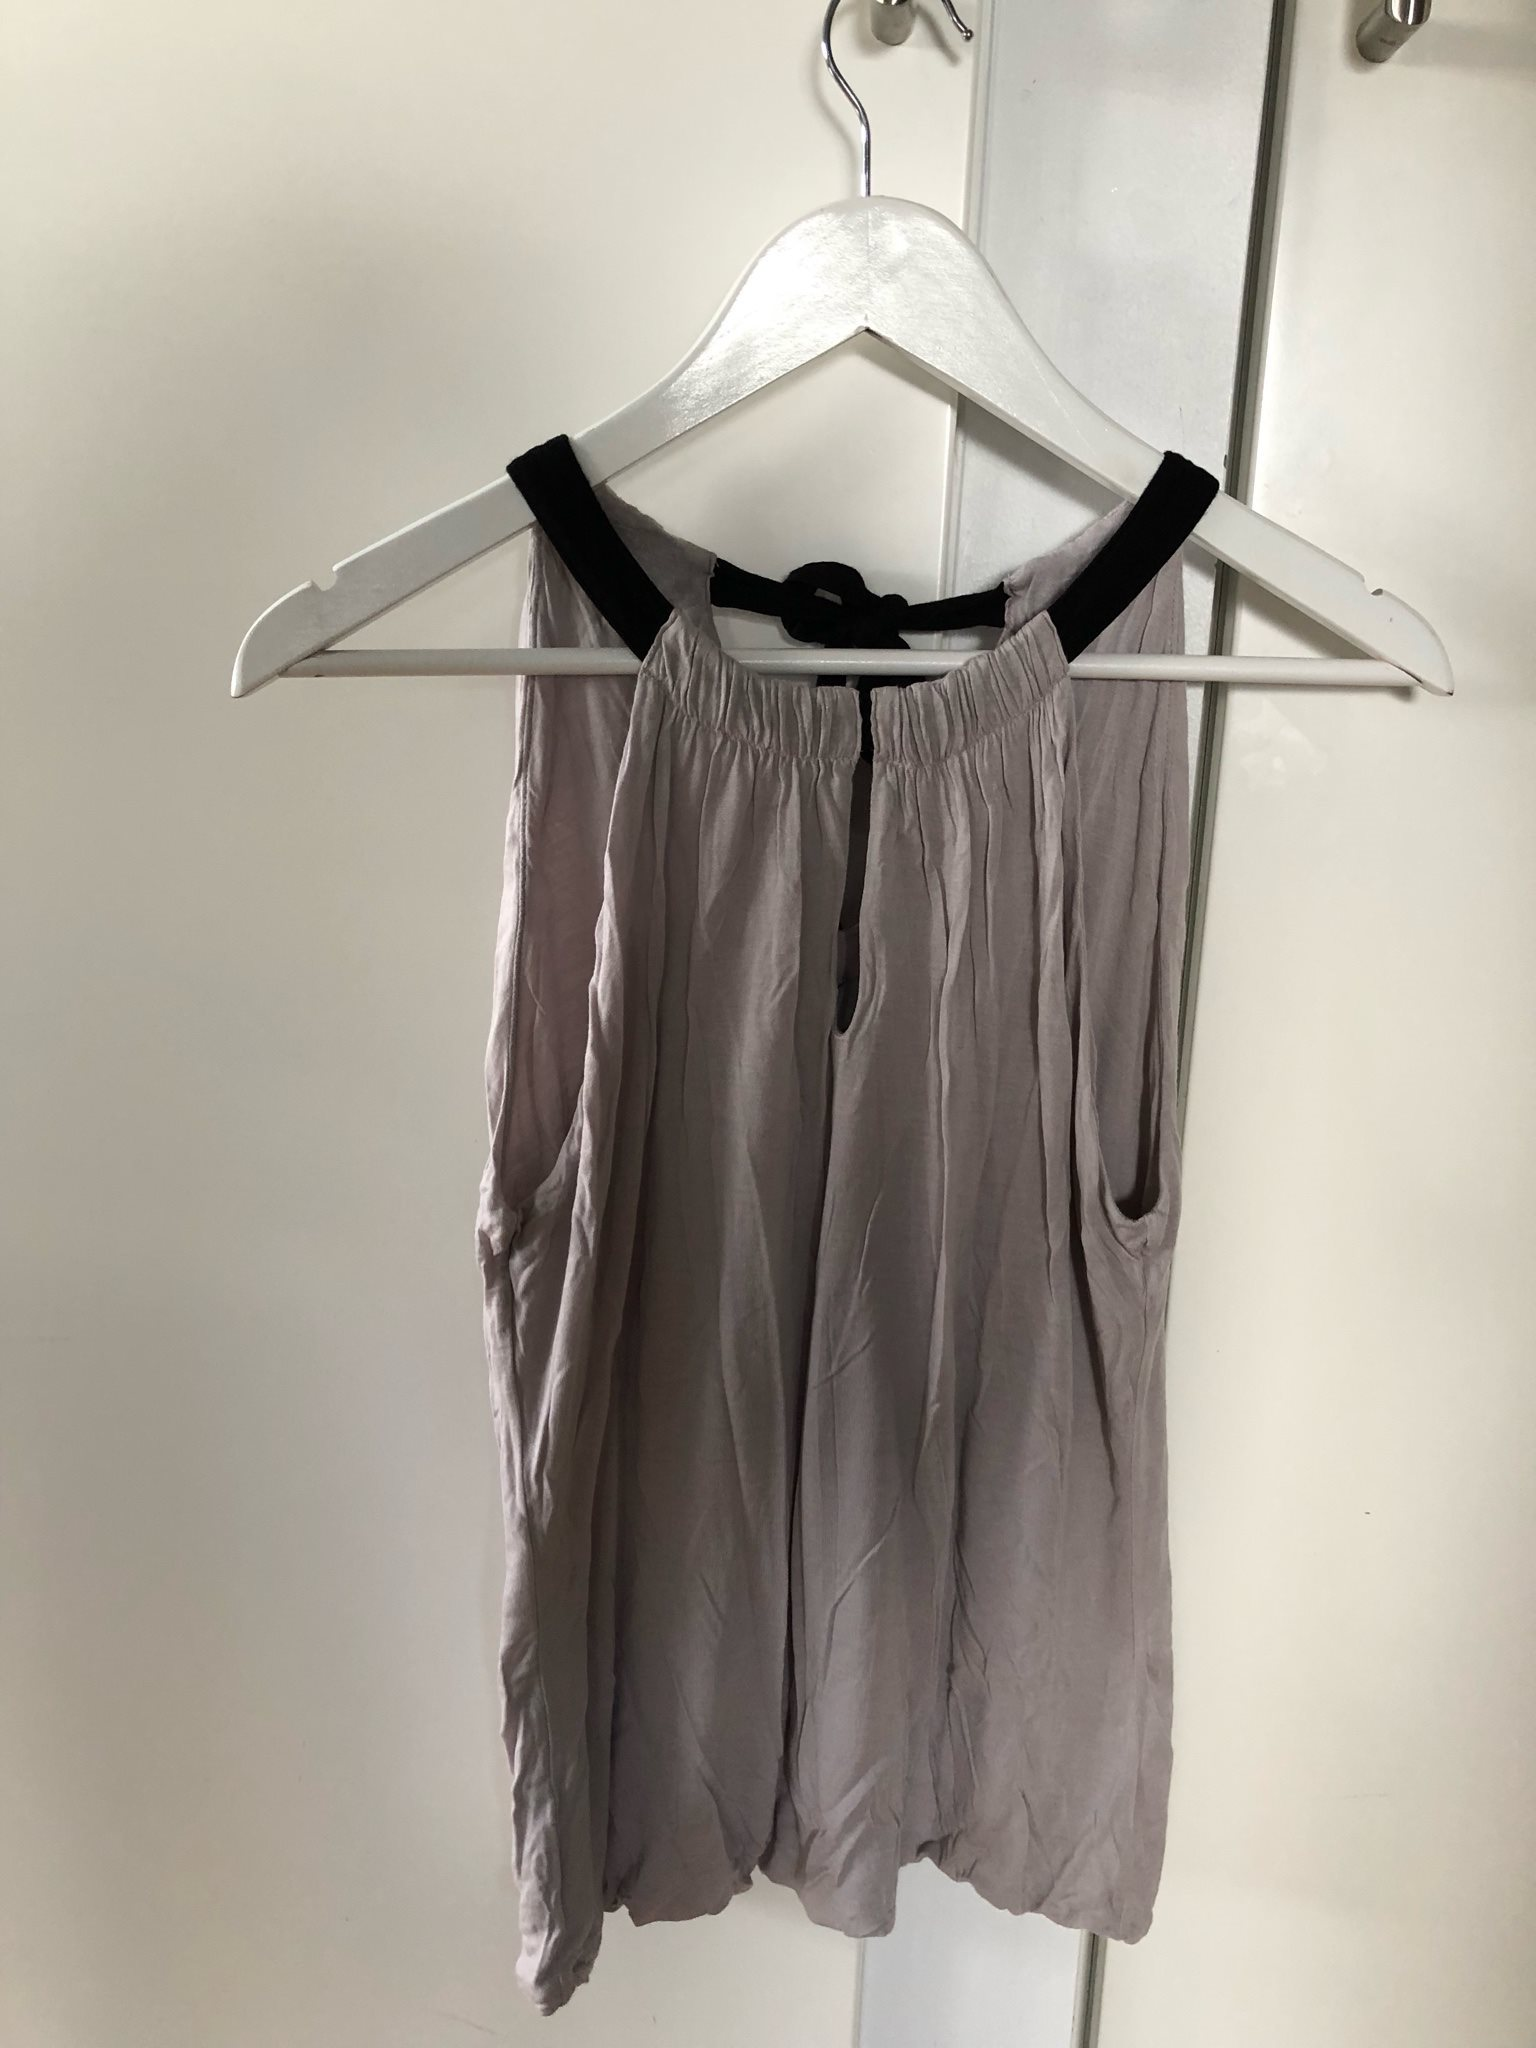 ÅRETS JULKLAPP! Beige grå linne halterneck svar.. (332494605) ᐈ Köp ... fc5396325d45d